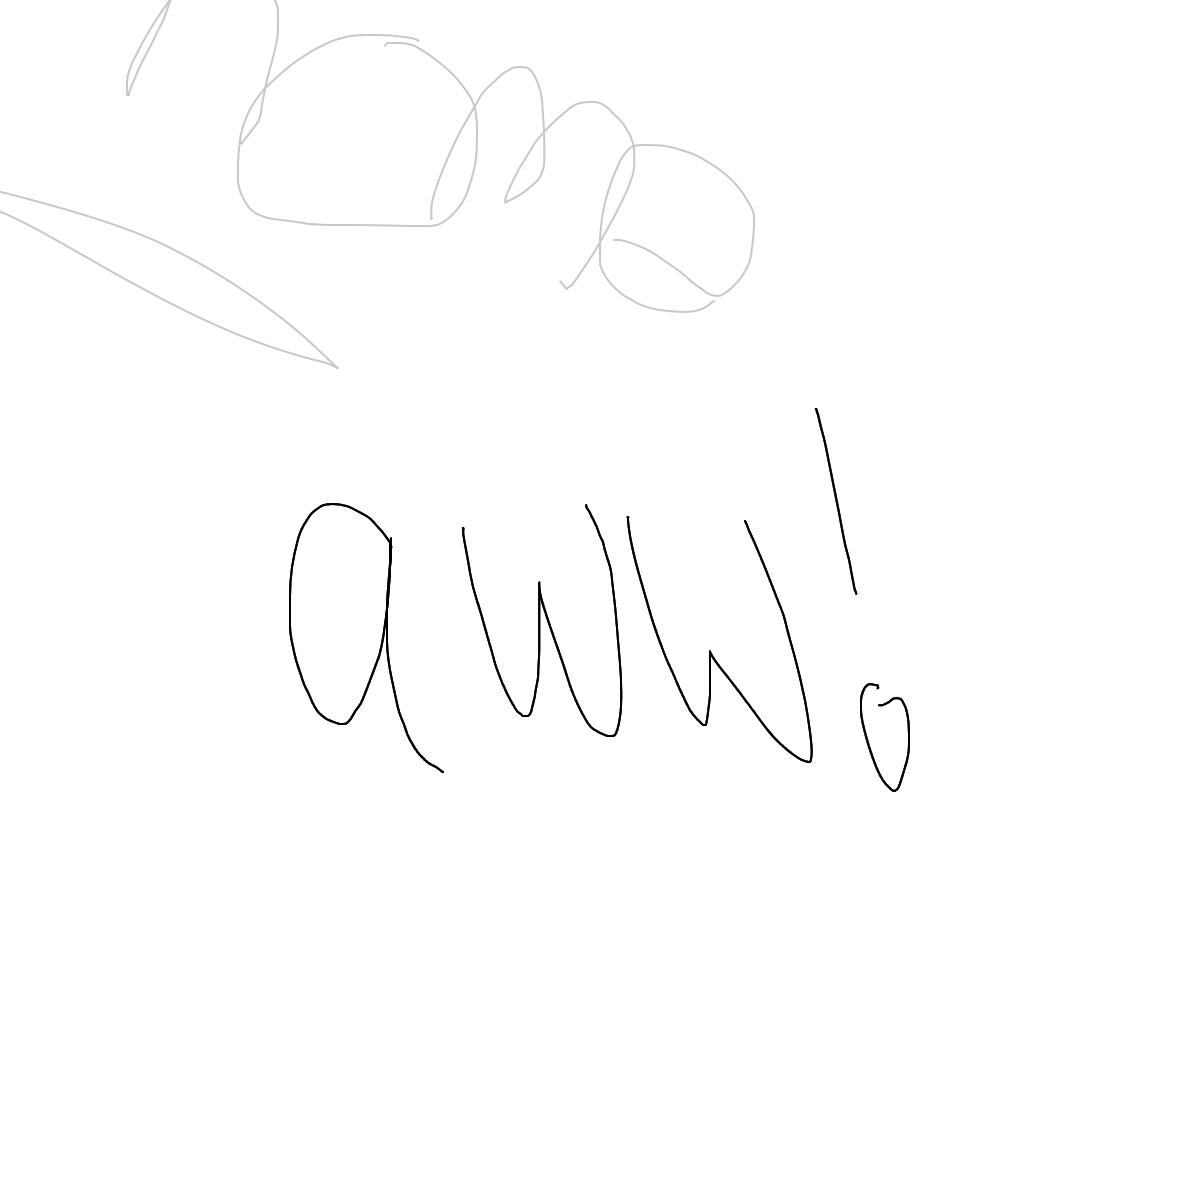 BAAAM drawing#2552 lat:51.3844337463378900lng: -2.3819215297698975